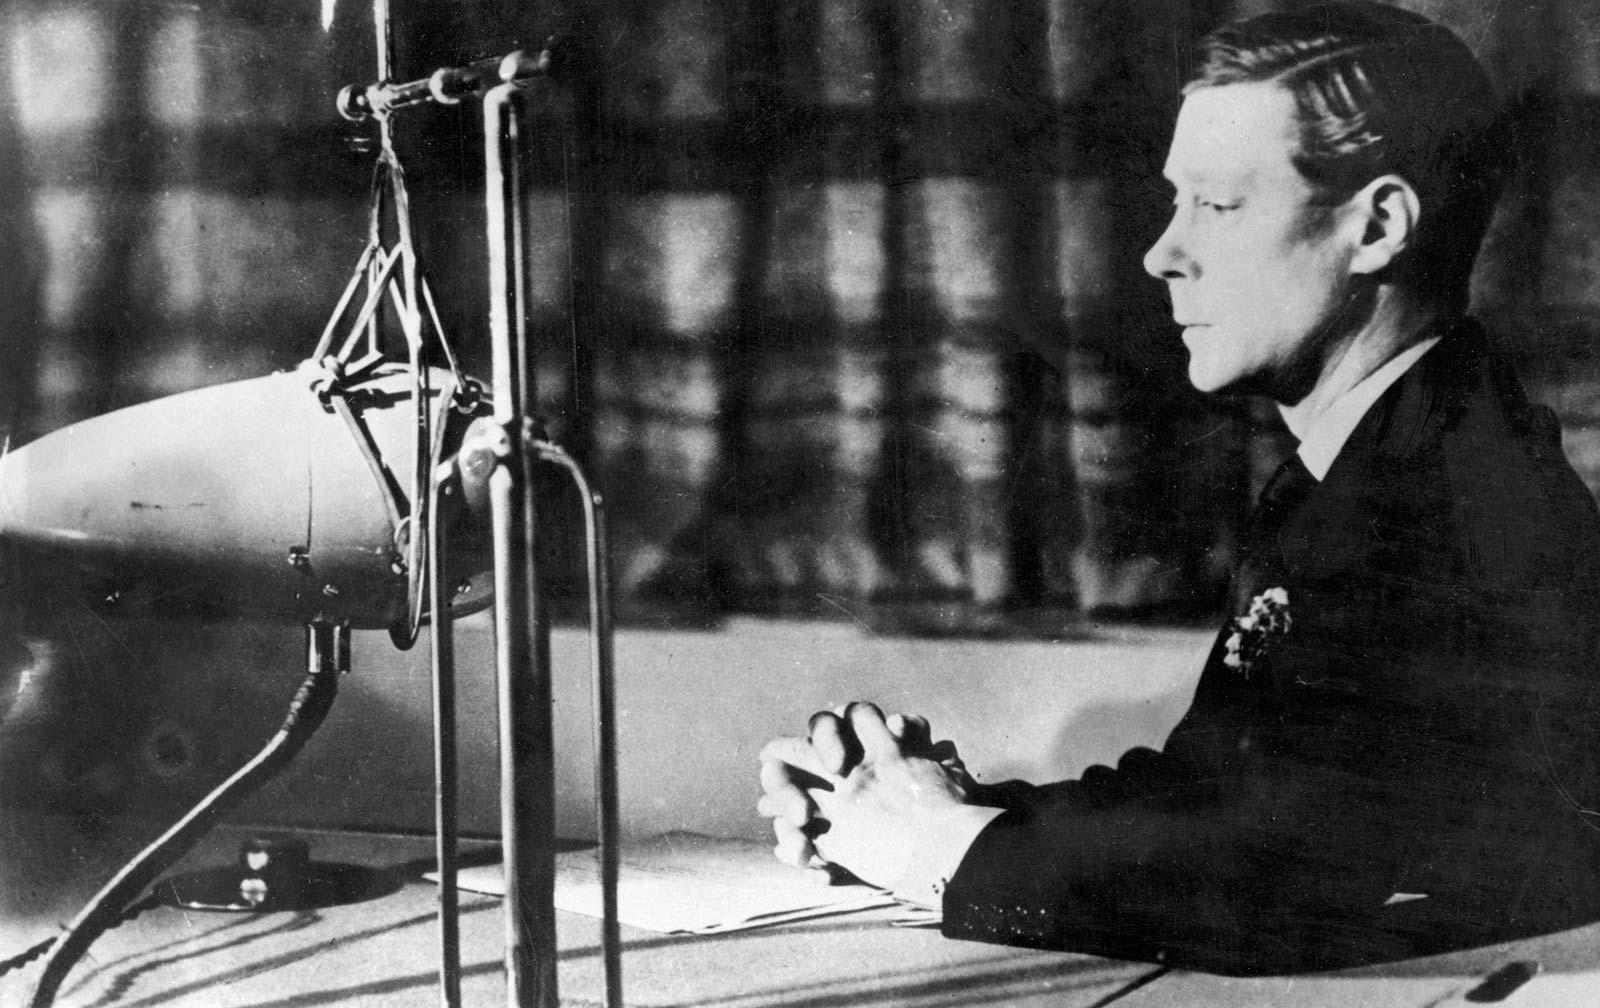 Edward viii abdication radio bbc december 11 1936